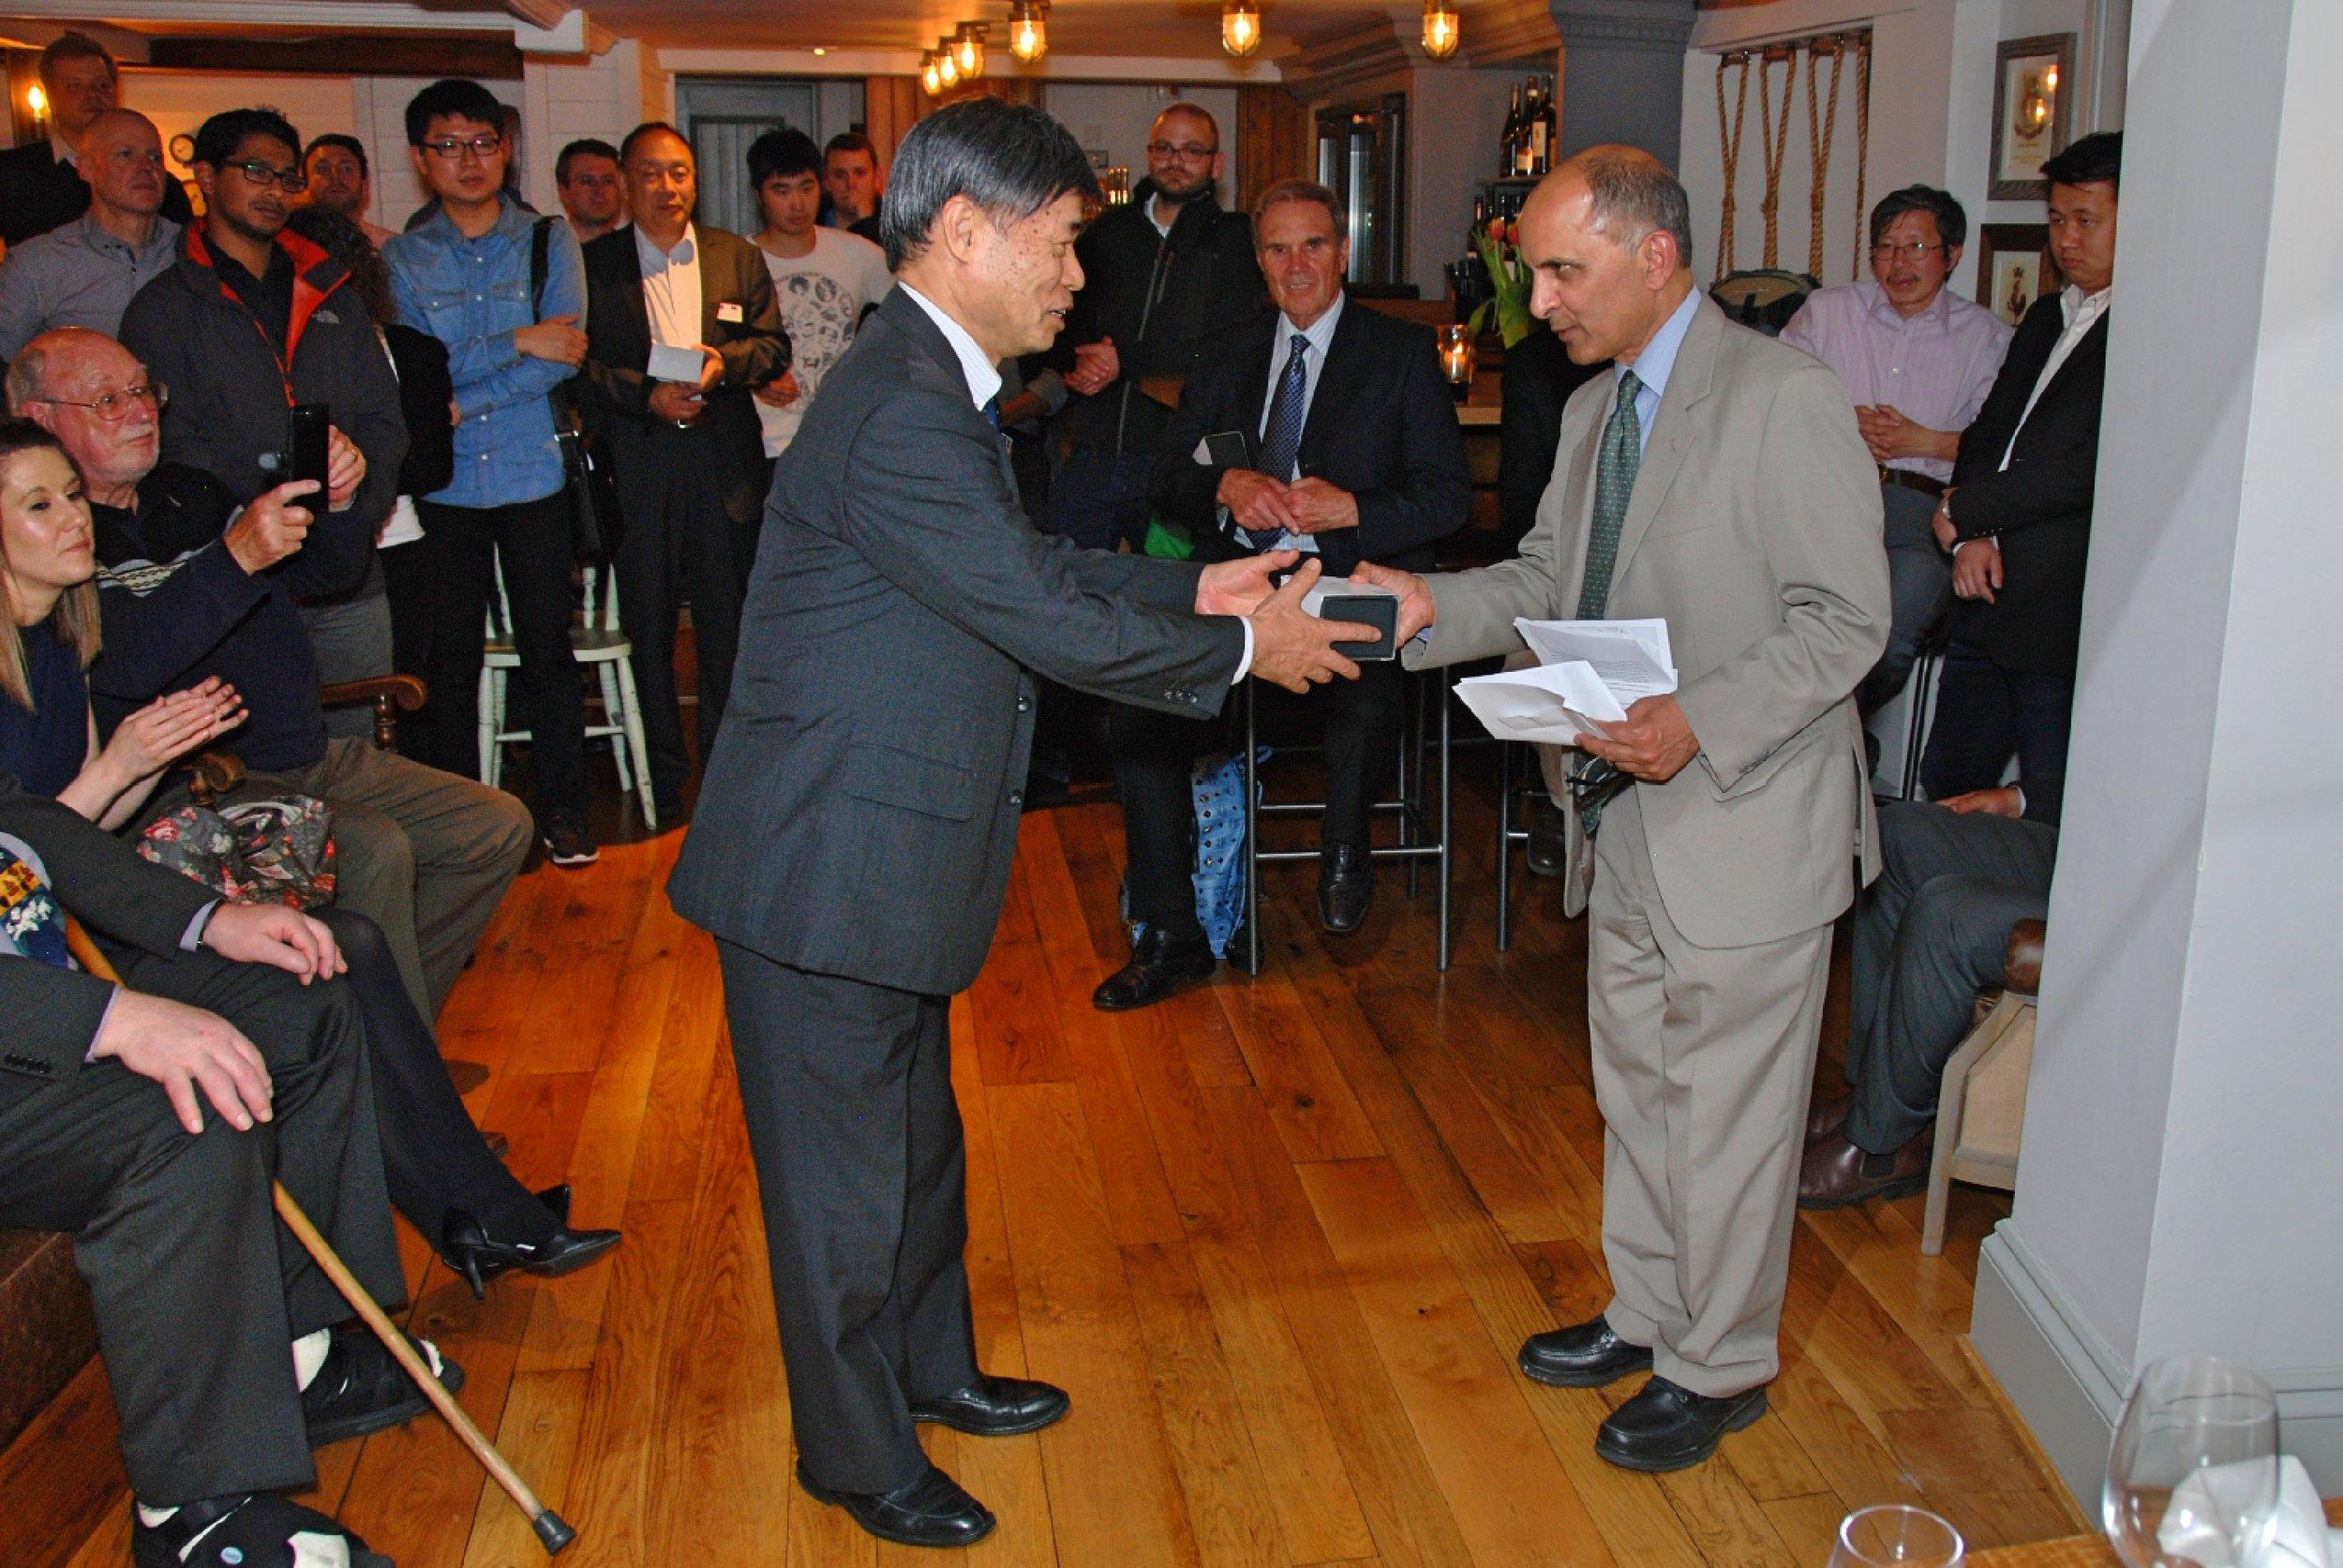 Award being presented to Prof. Yomei Yoshioka of Ehime University, Japan